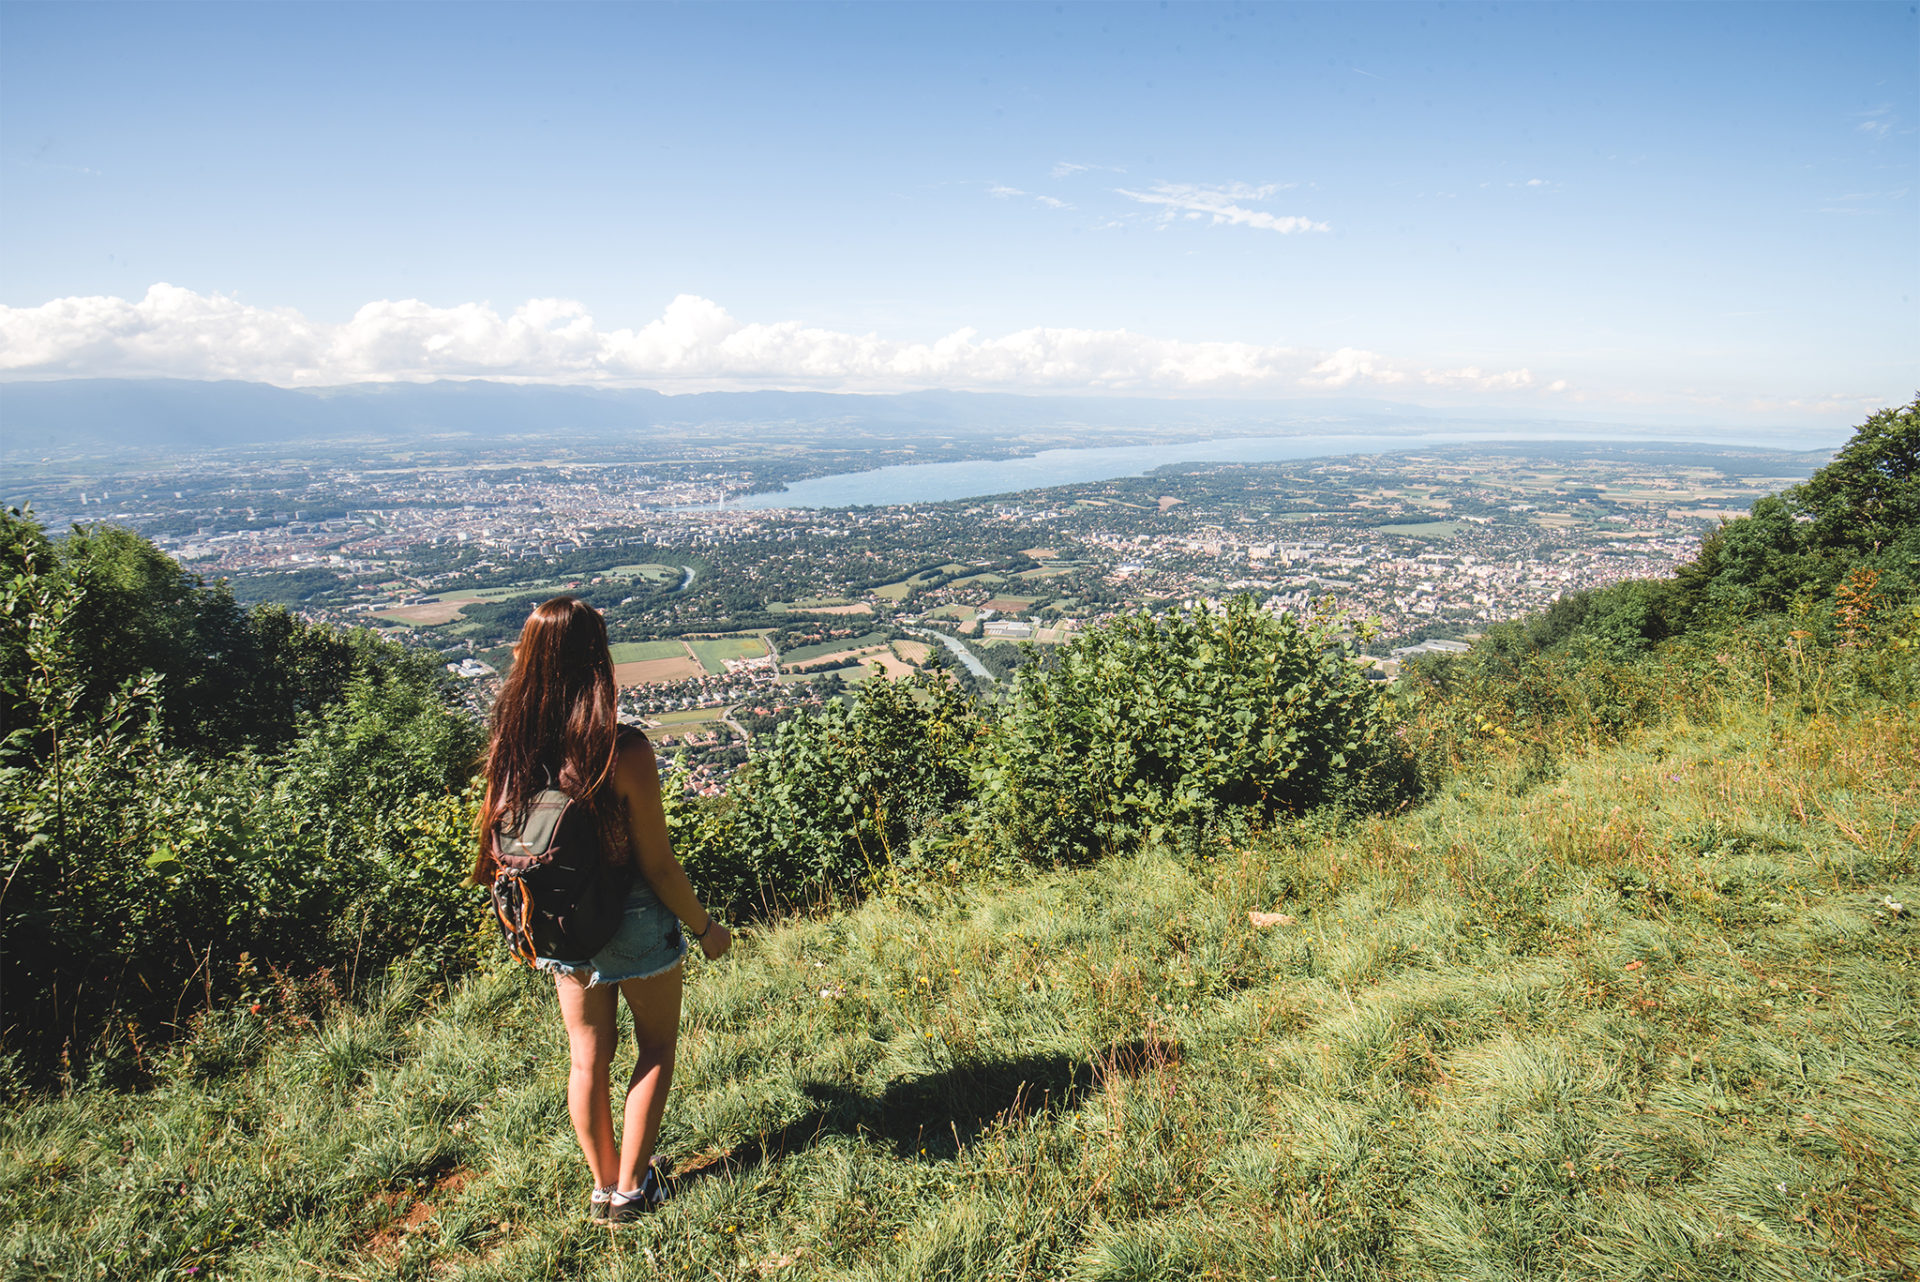 Monter au Mont Salève, Genève